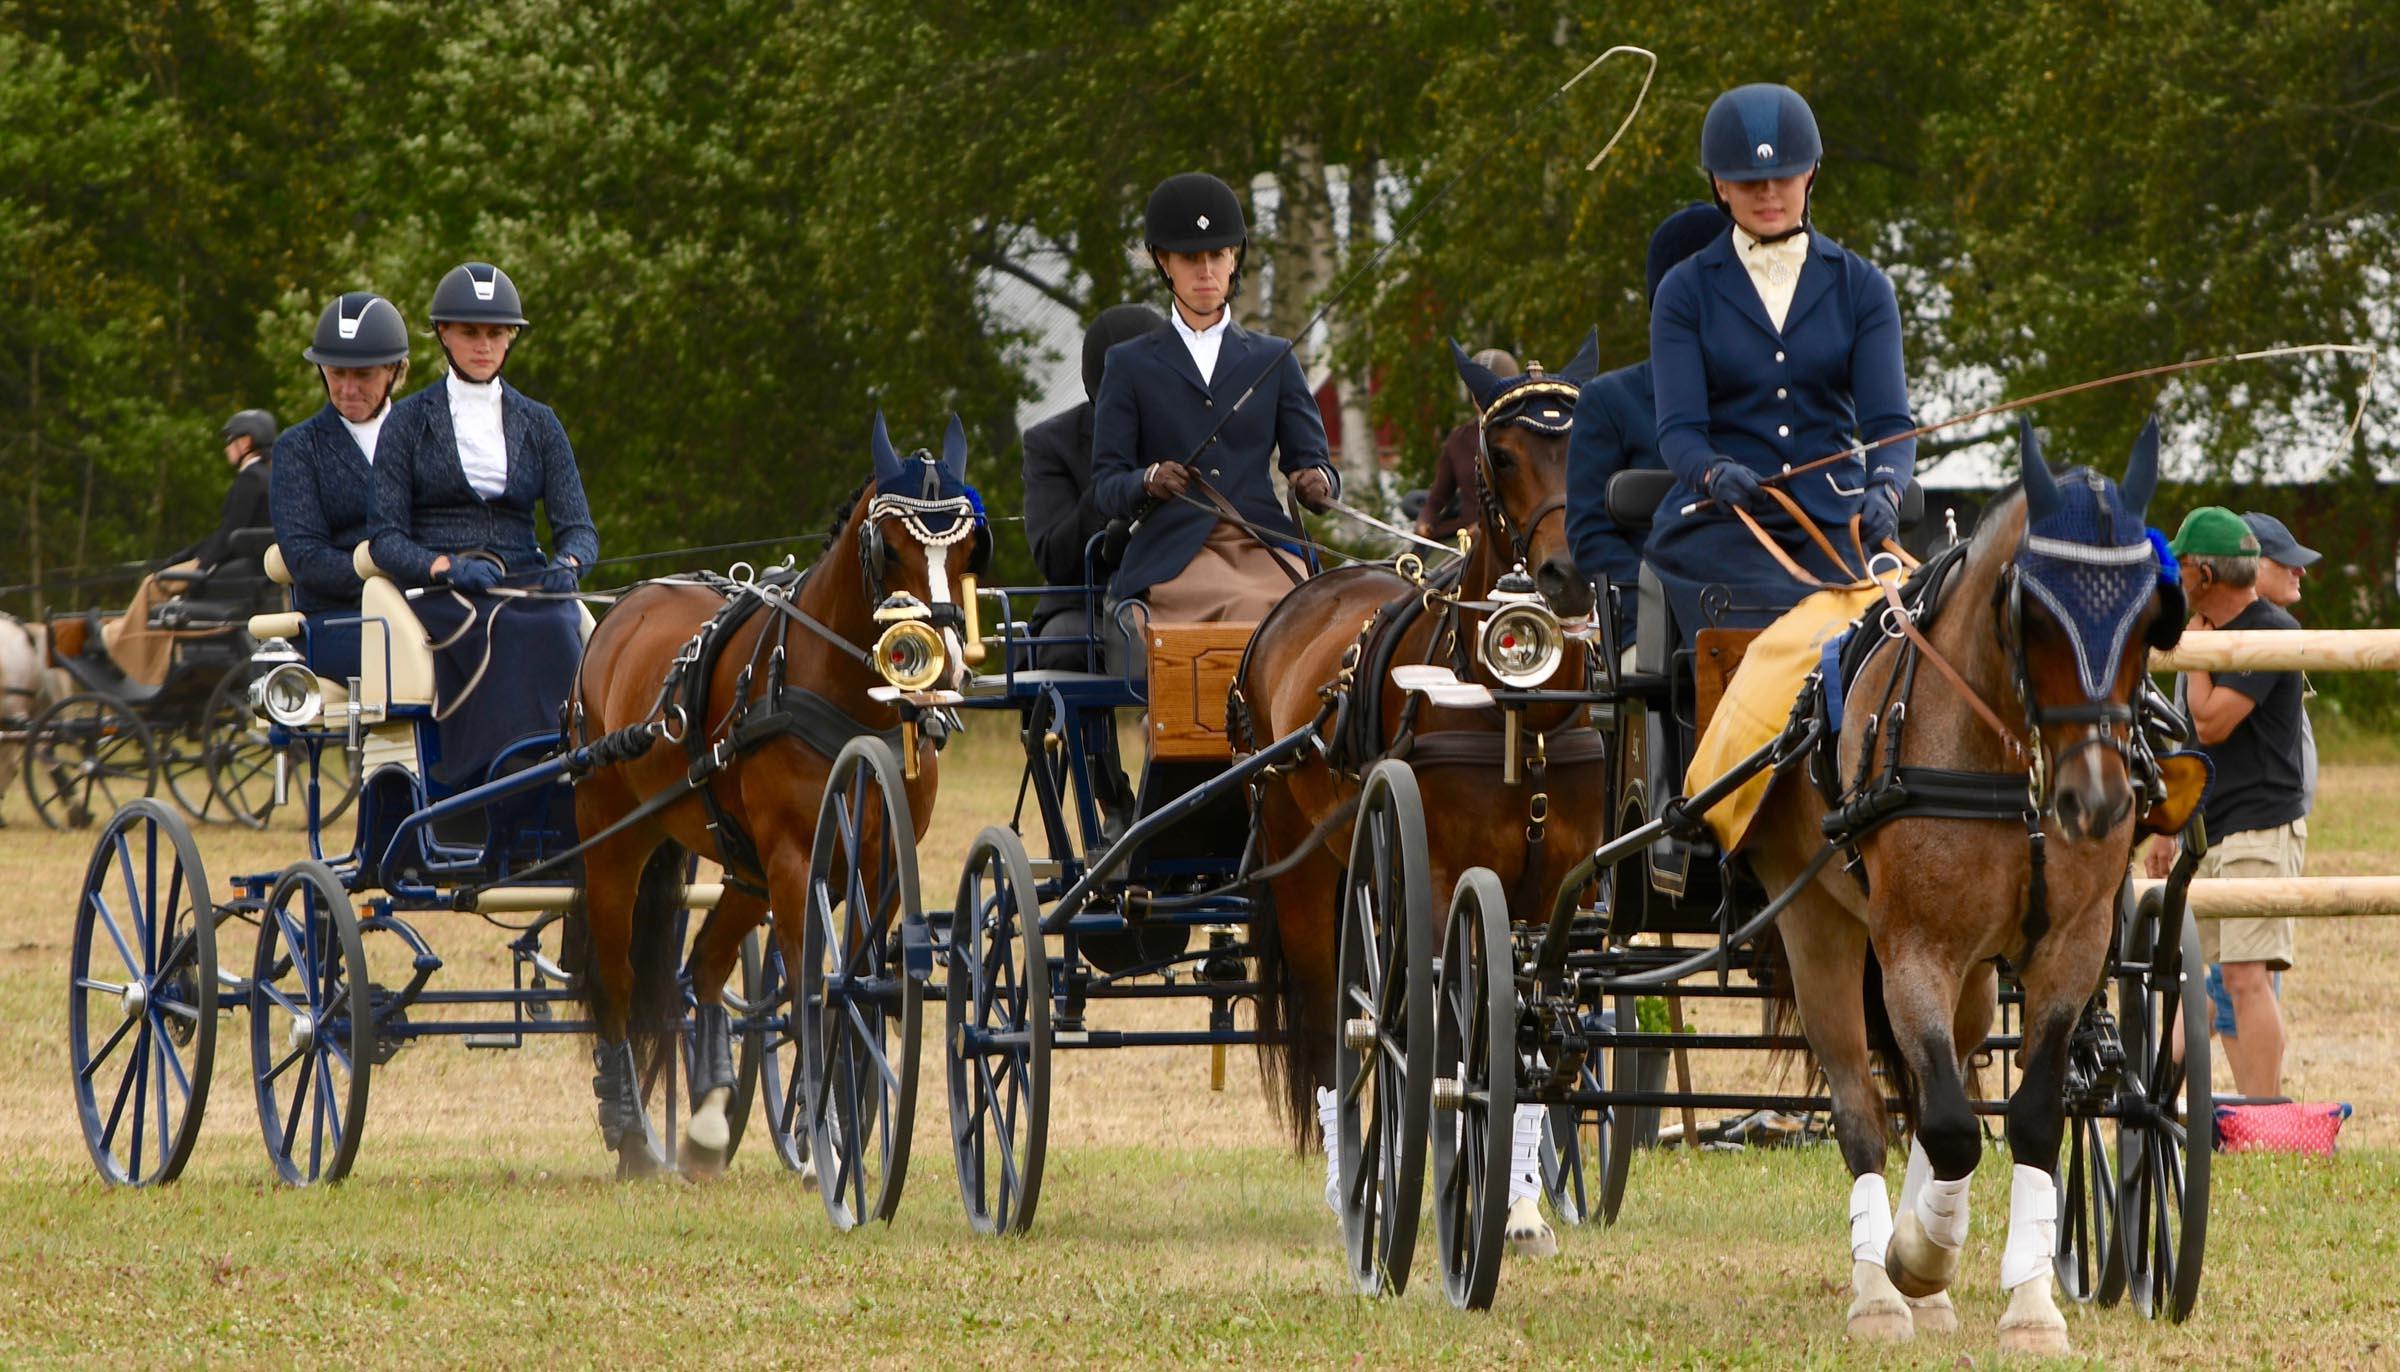 180722-ponny-singel-linnea-kristiansen-anna-racking-johanna-nilsson -k.s Dsc_3854